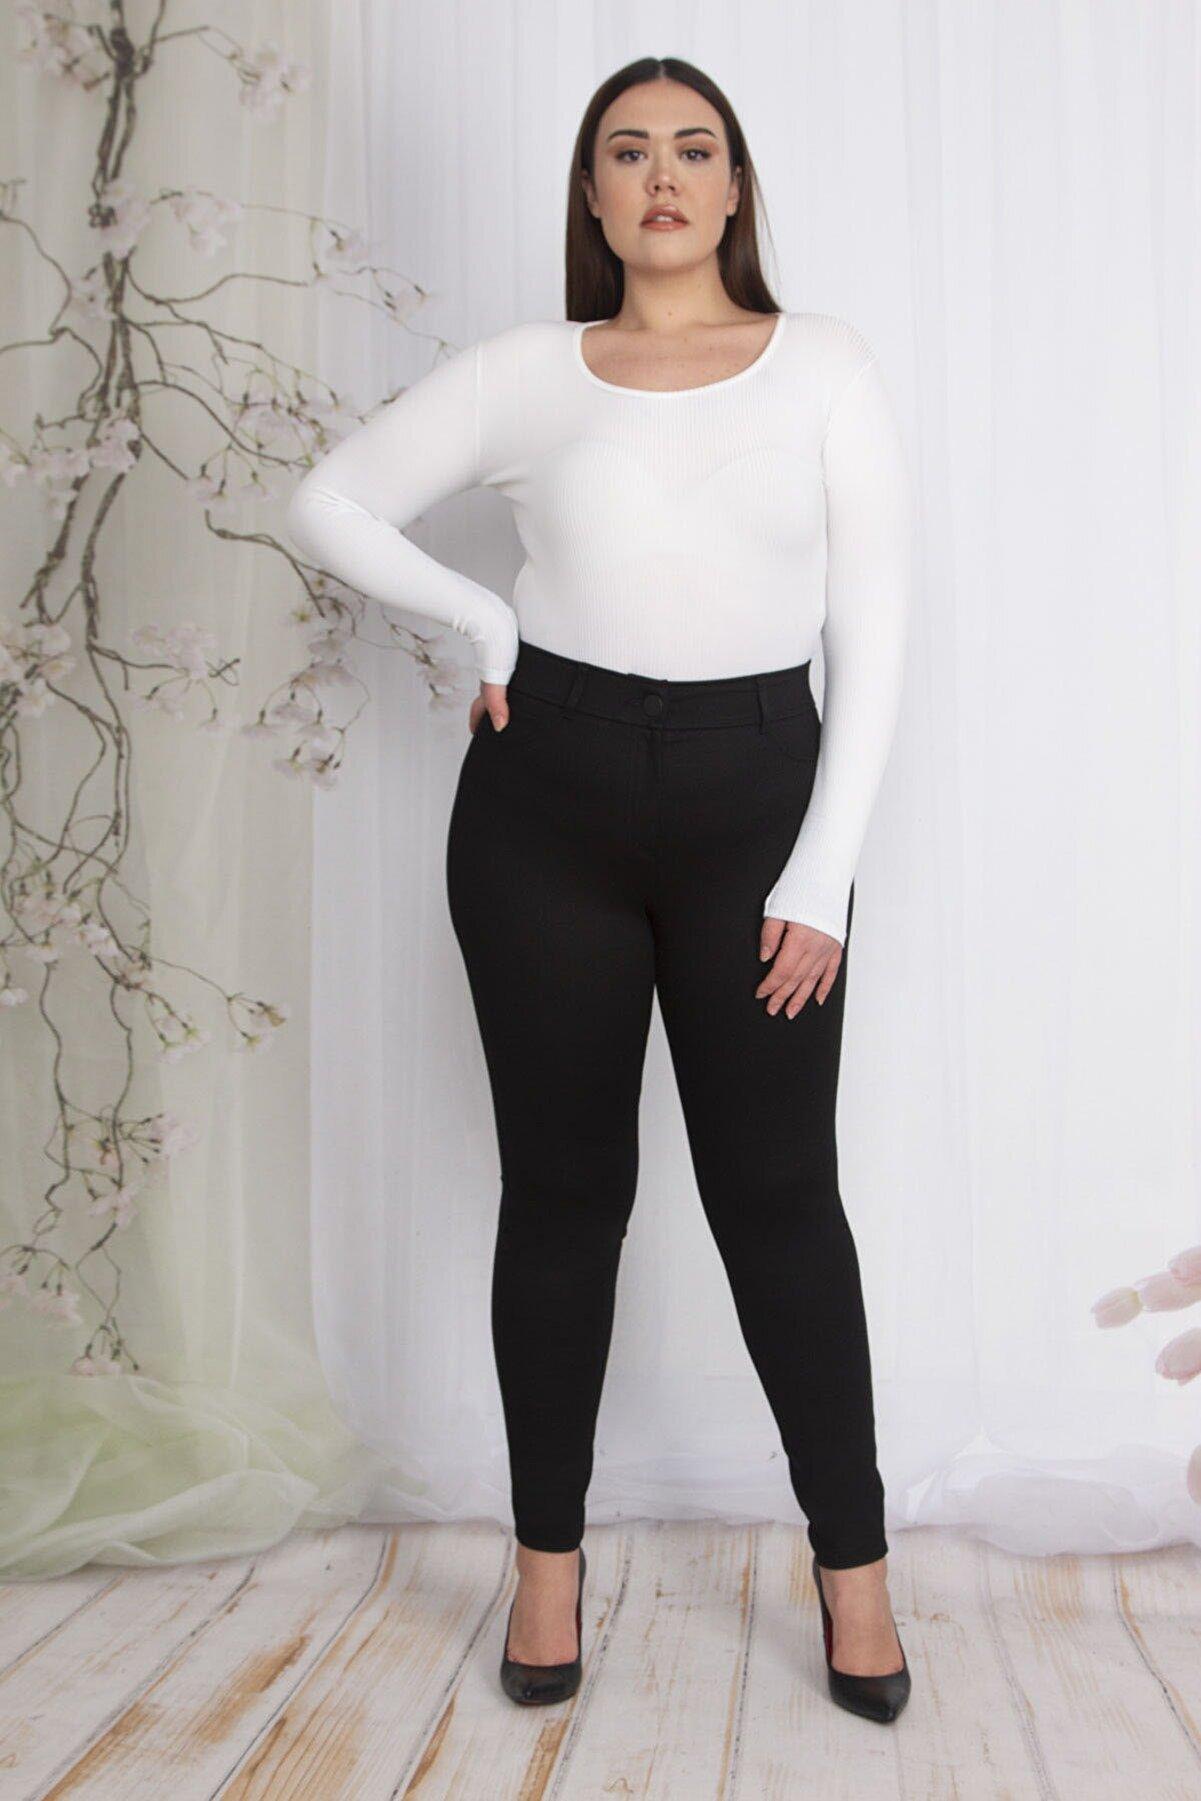 Şans Kadın Siyah Süs Cepli Tayt Pantolon 65N22347